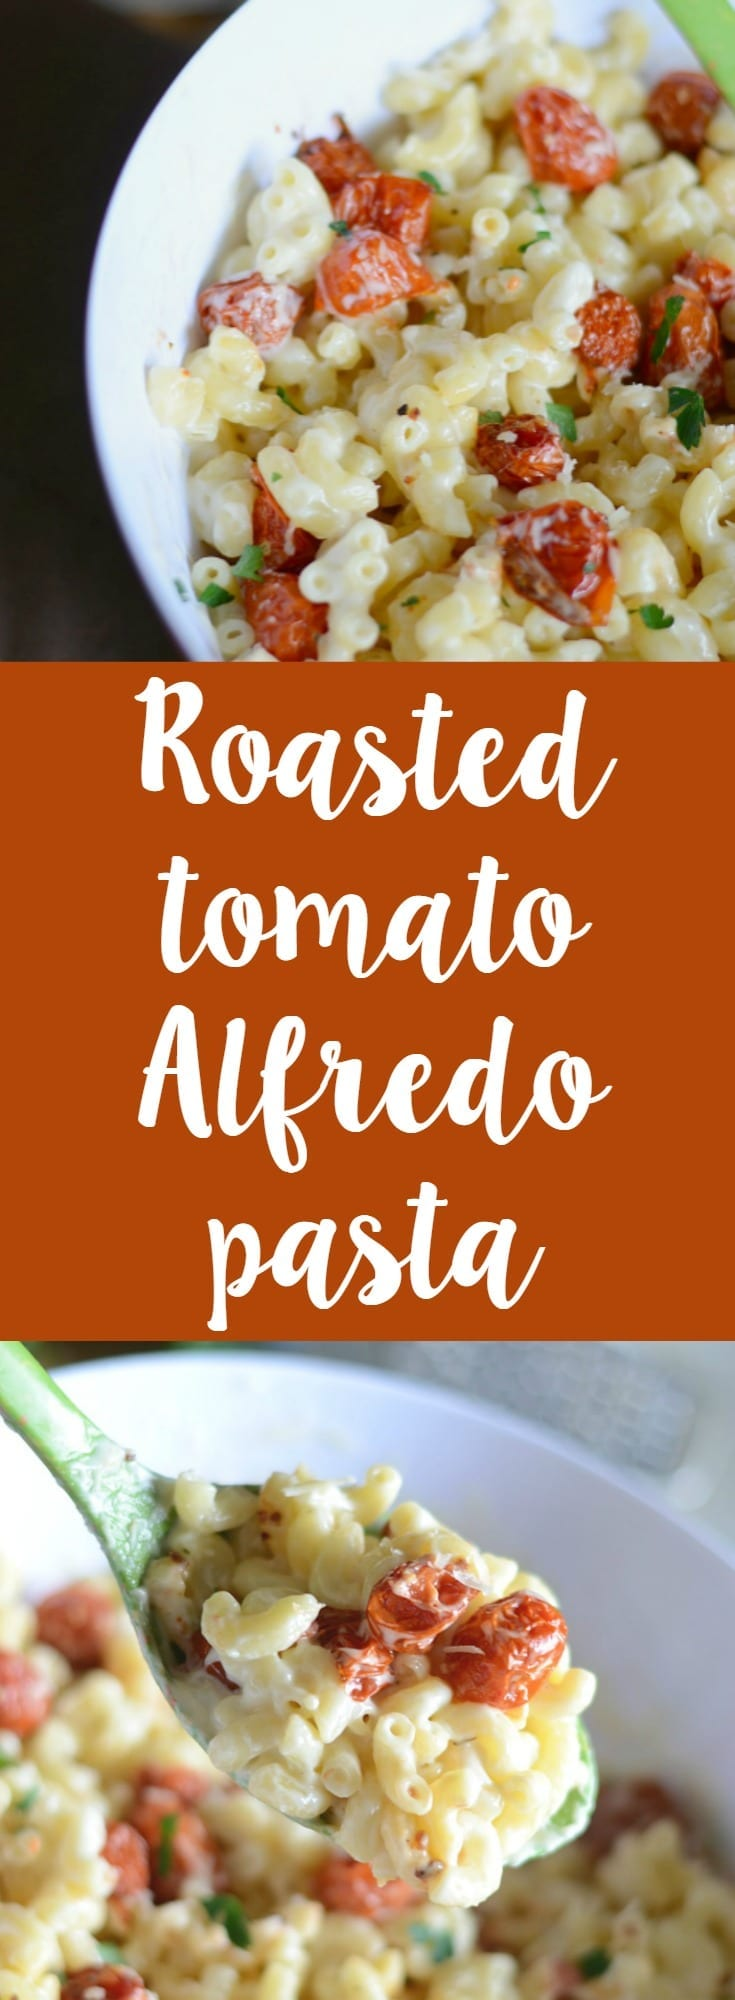 Roasted tomato Alfredo pasta recipe! Make this easy pasta at home